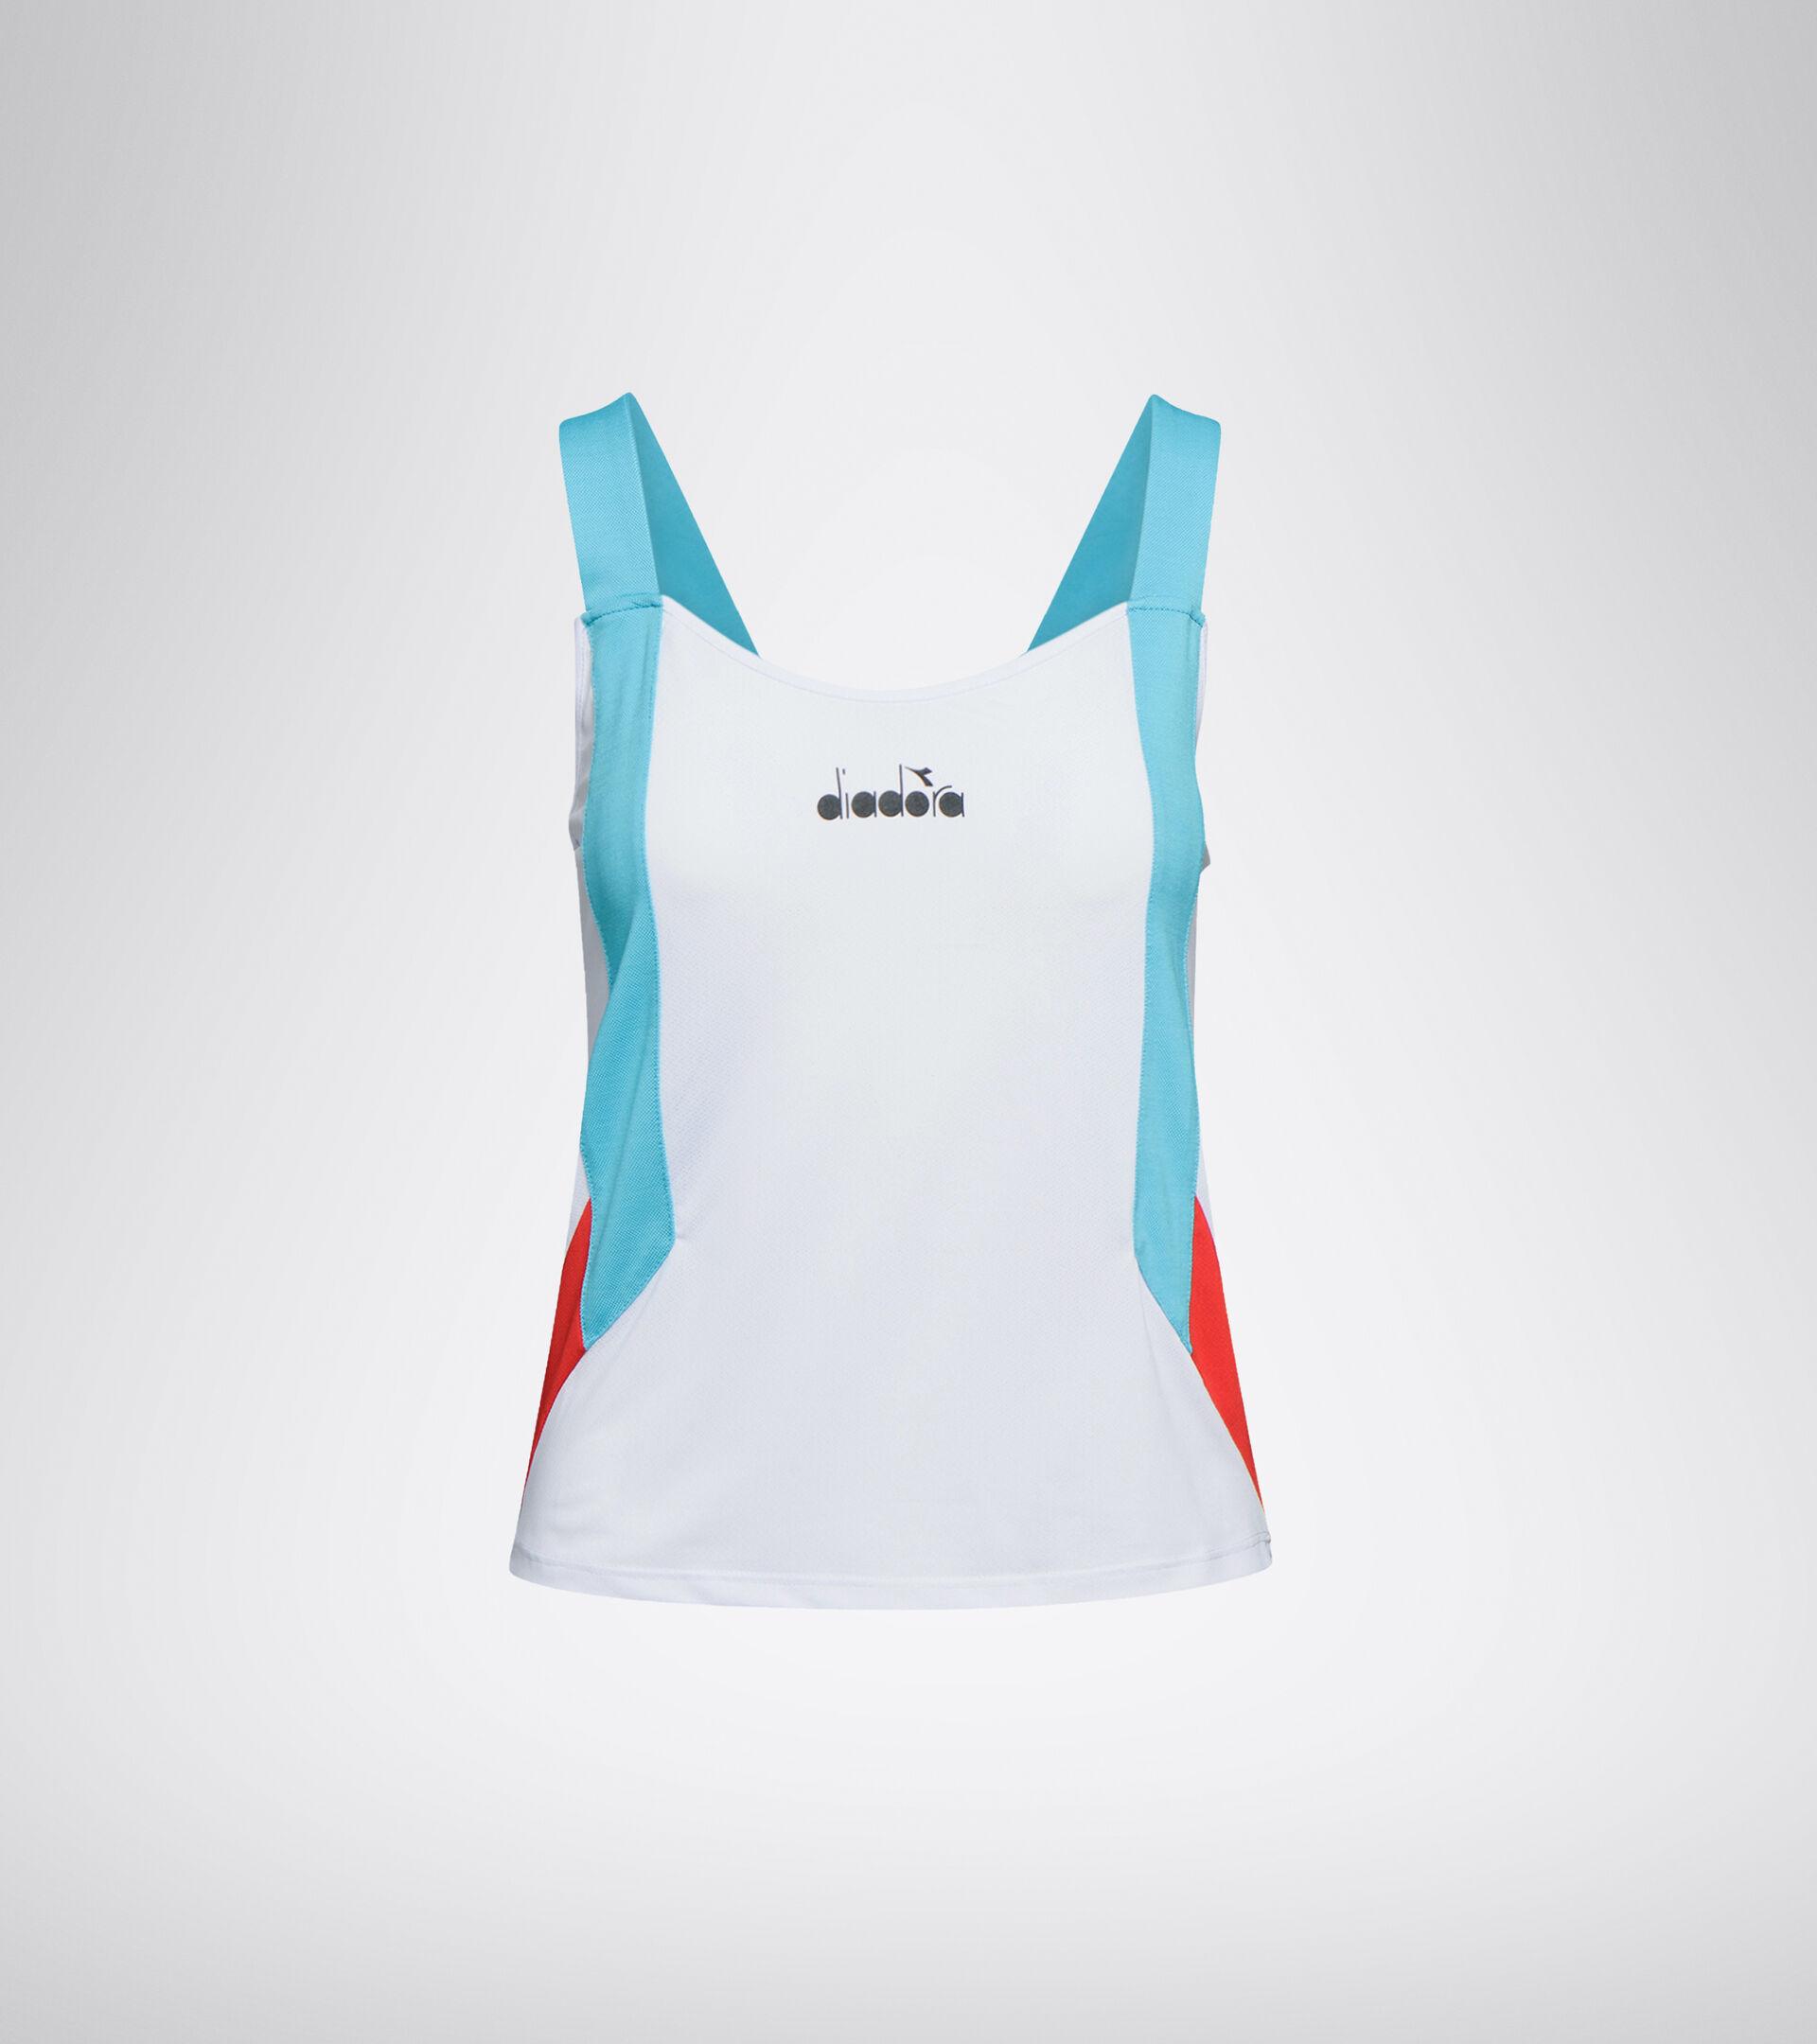 Camiseta sin mangas de tenis - Mujer L. TANK BLANCO VIVO - Diadora